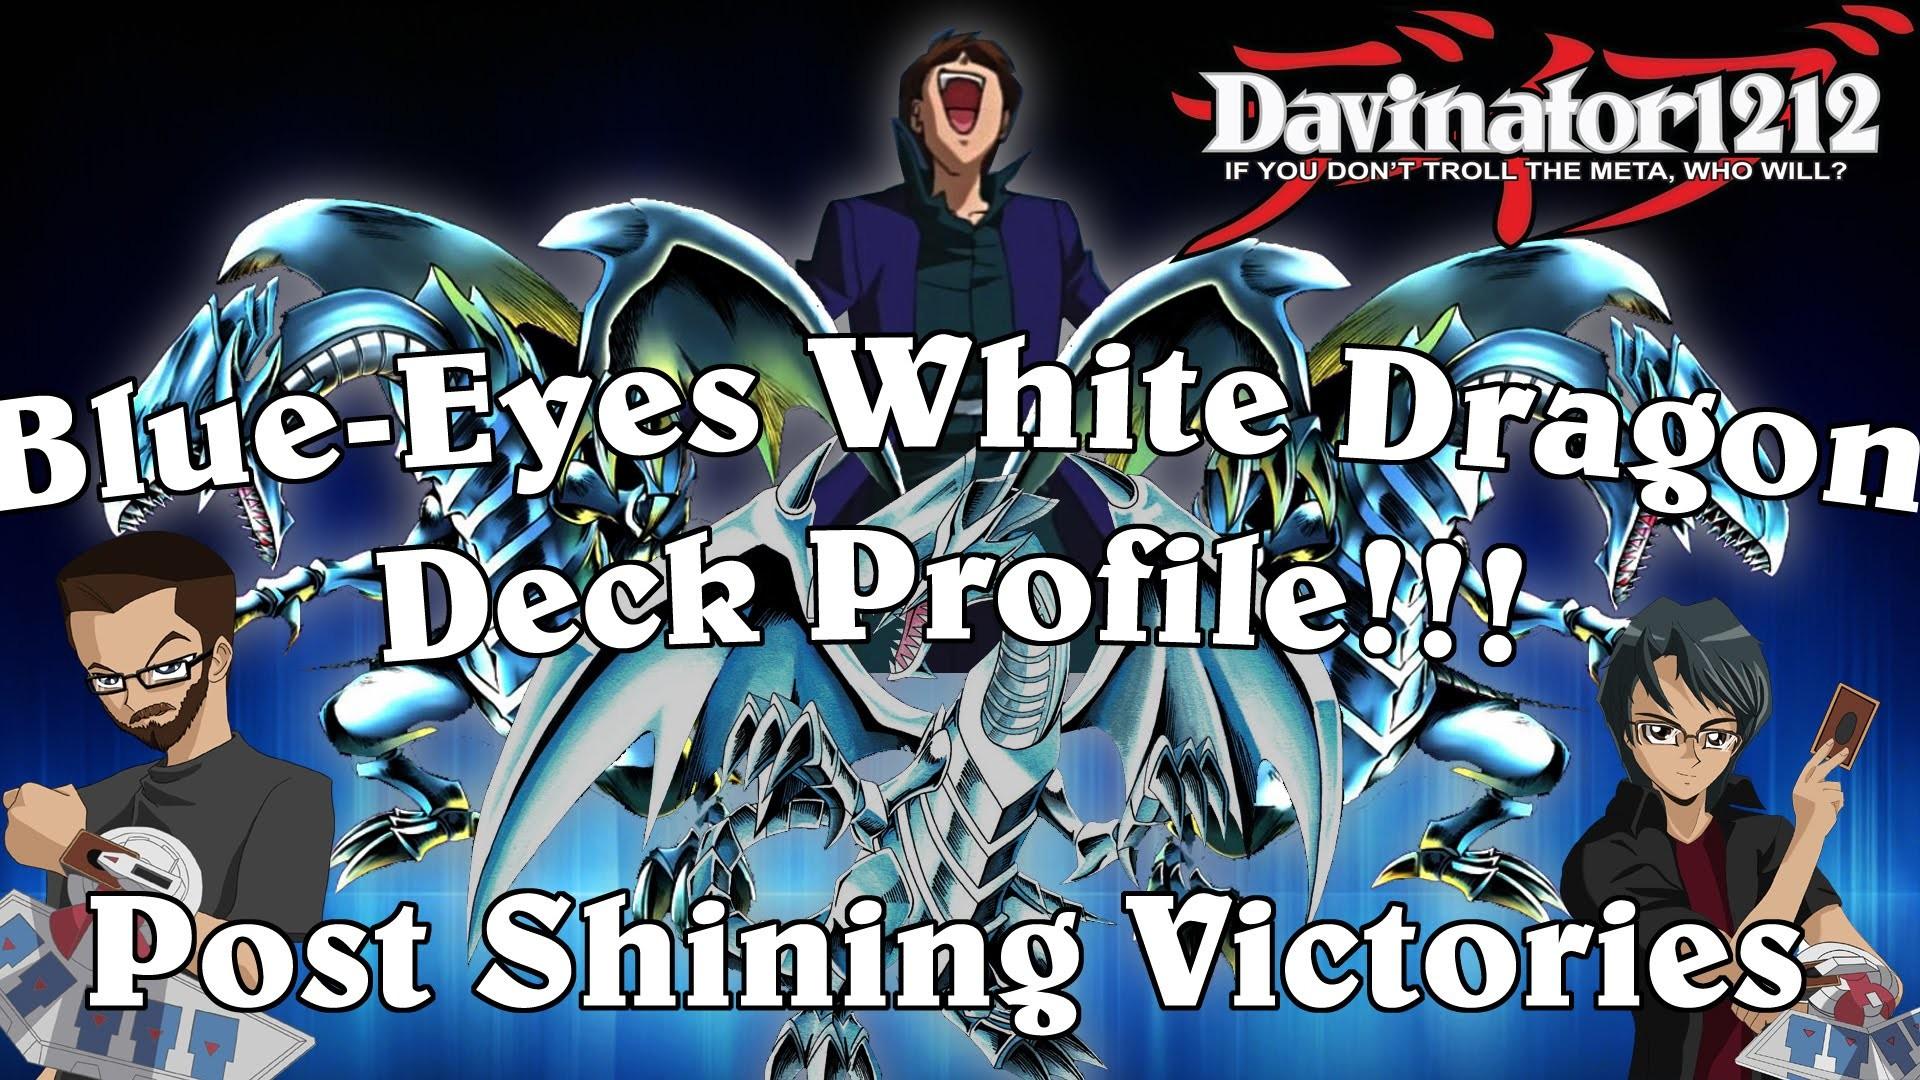 Explosive Blue-Eyes White Dragon Deck Profile! Post Shining Victories!  (SHVI 2016)